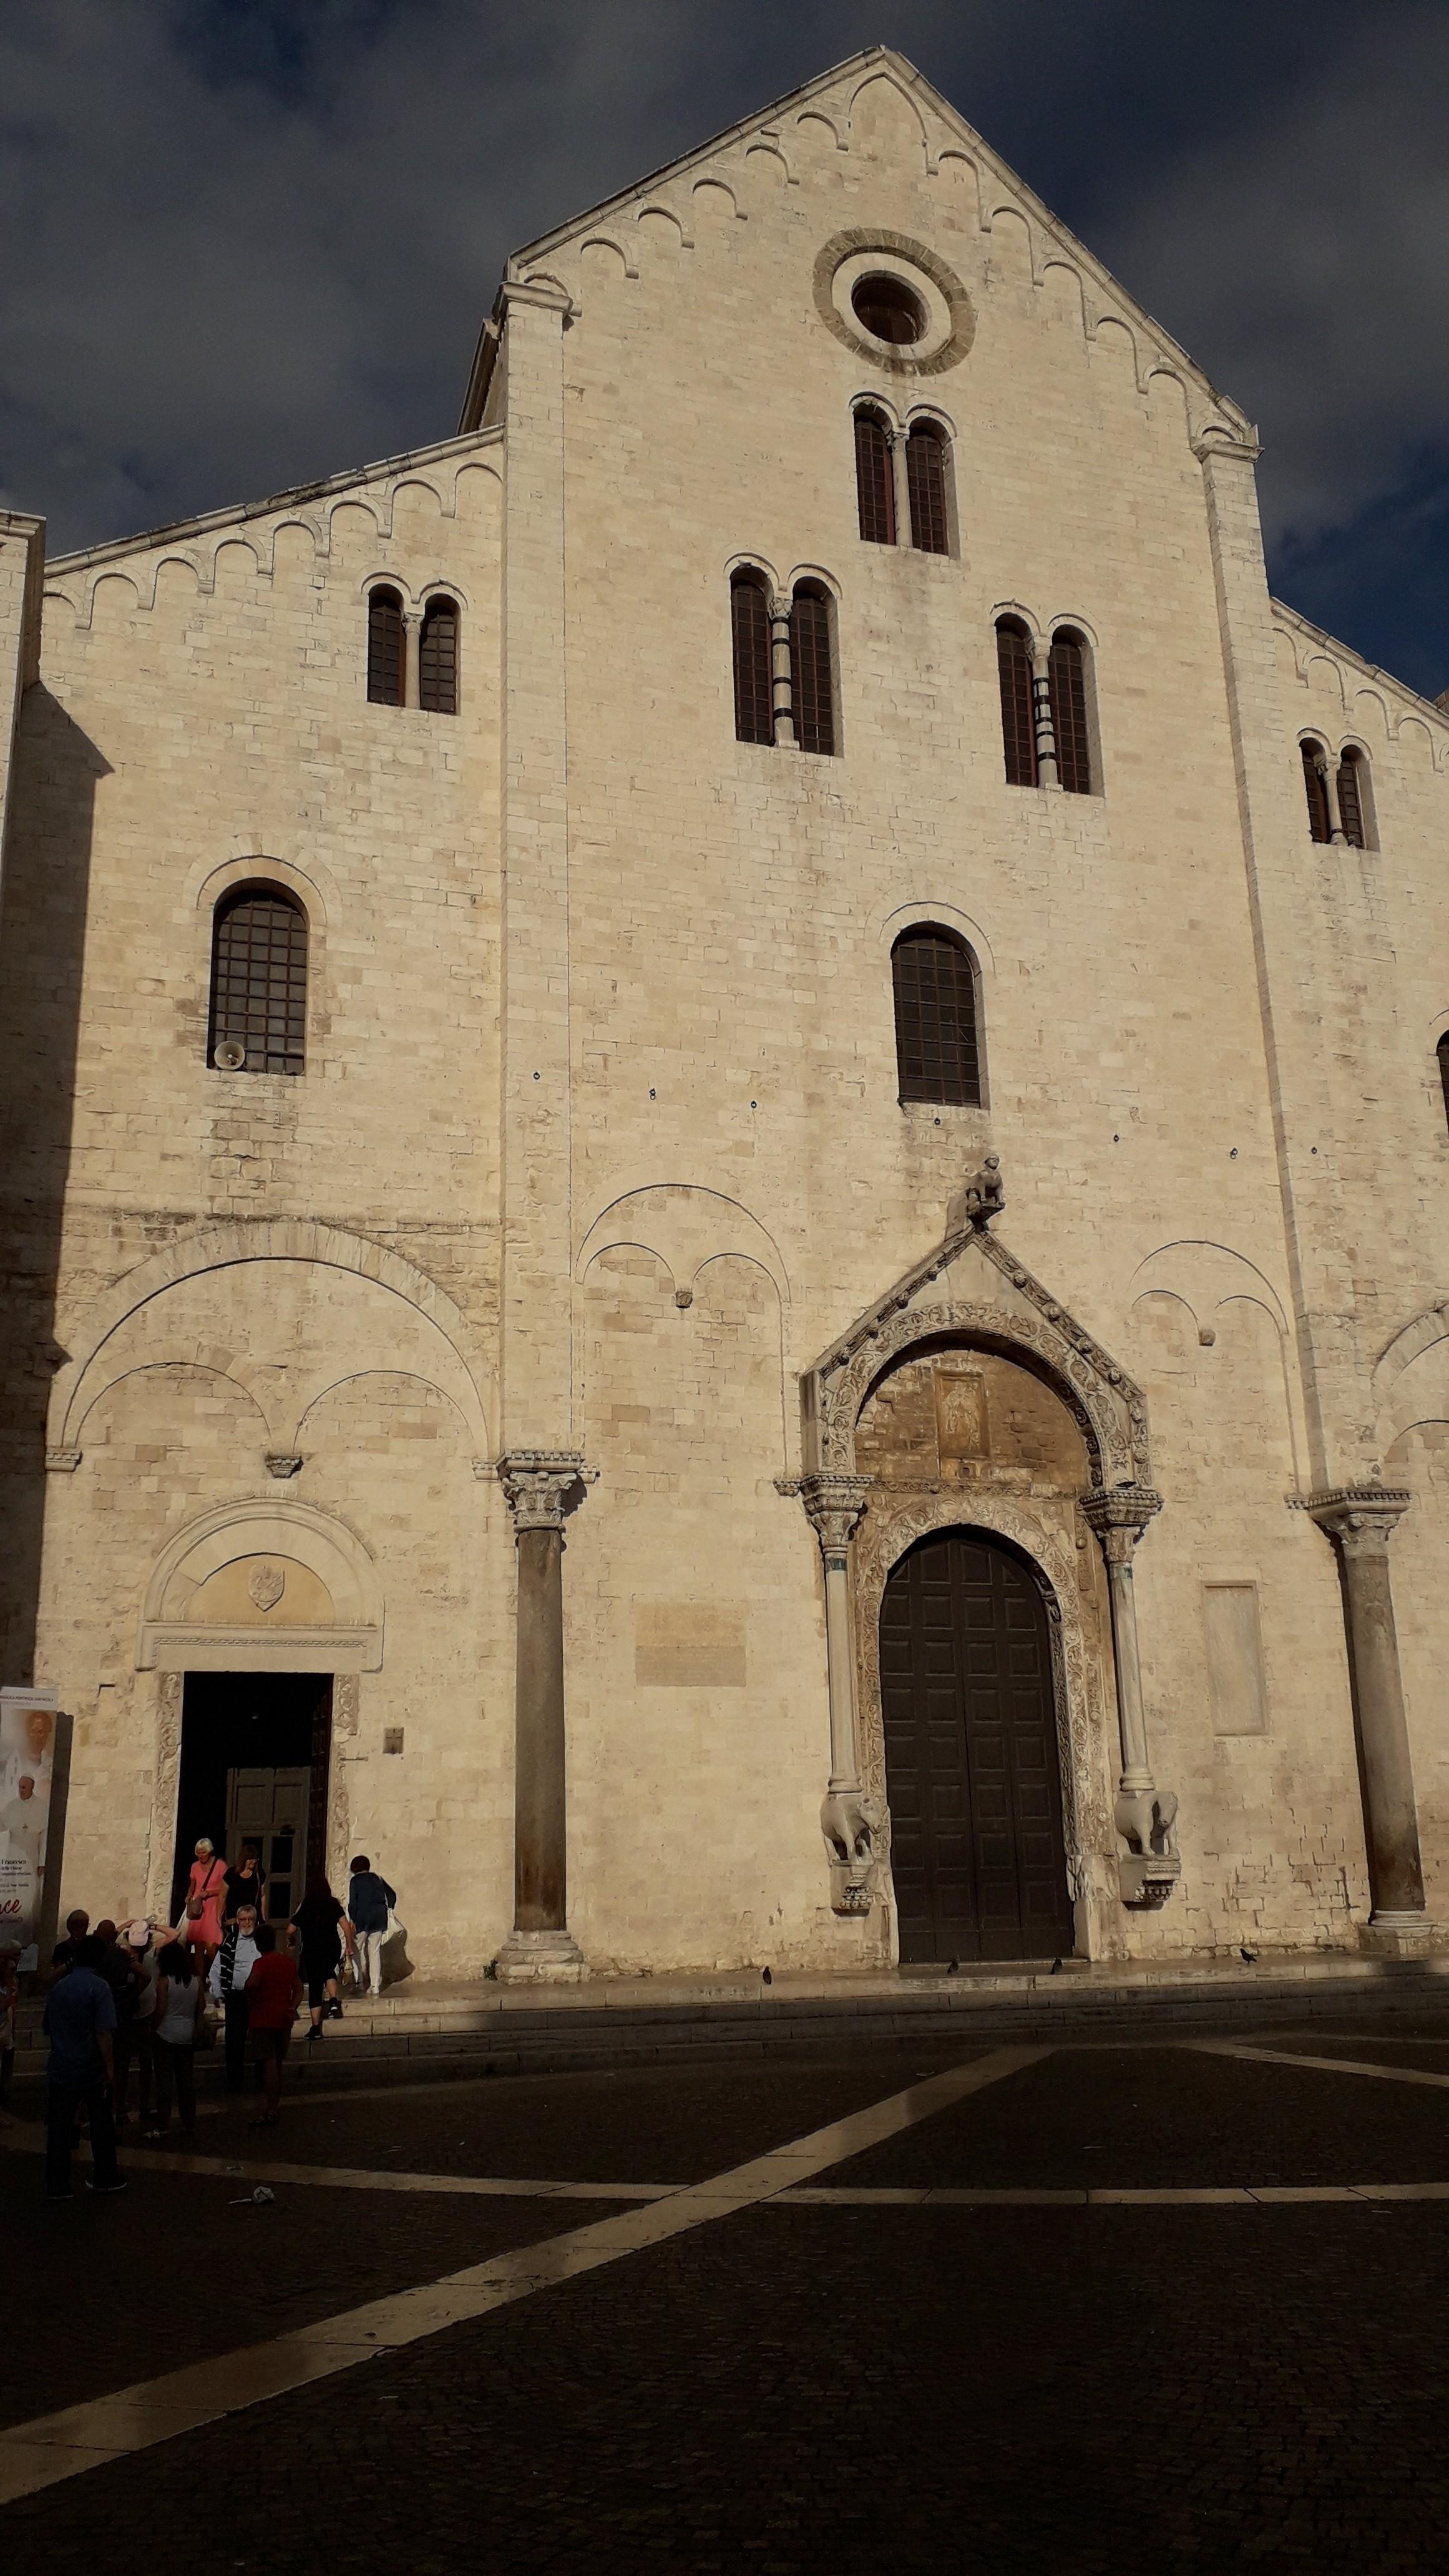 Biserica San Nicola din Bari